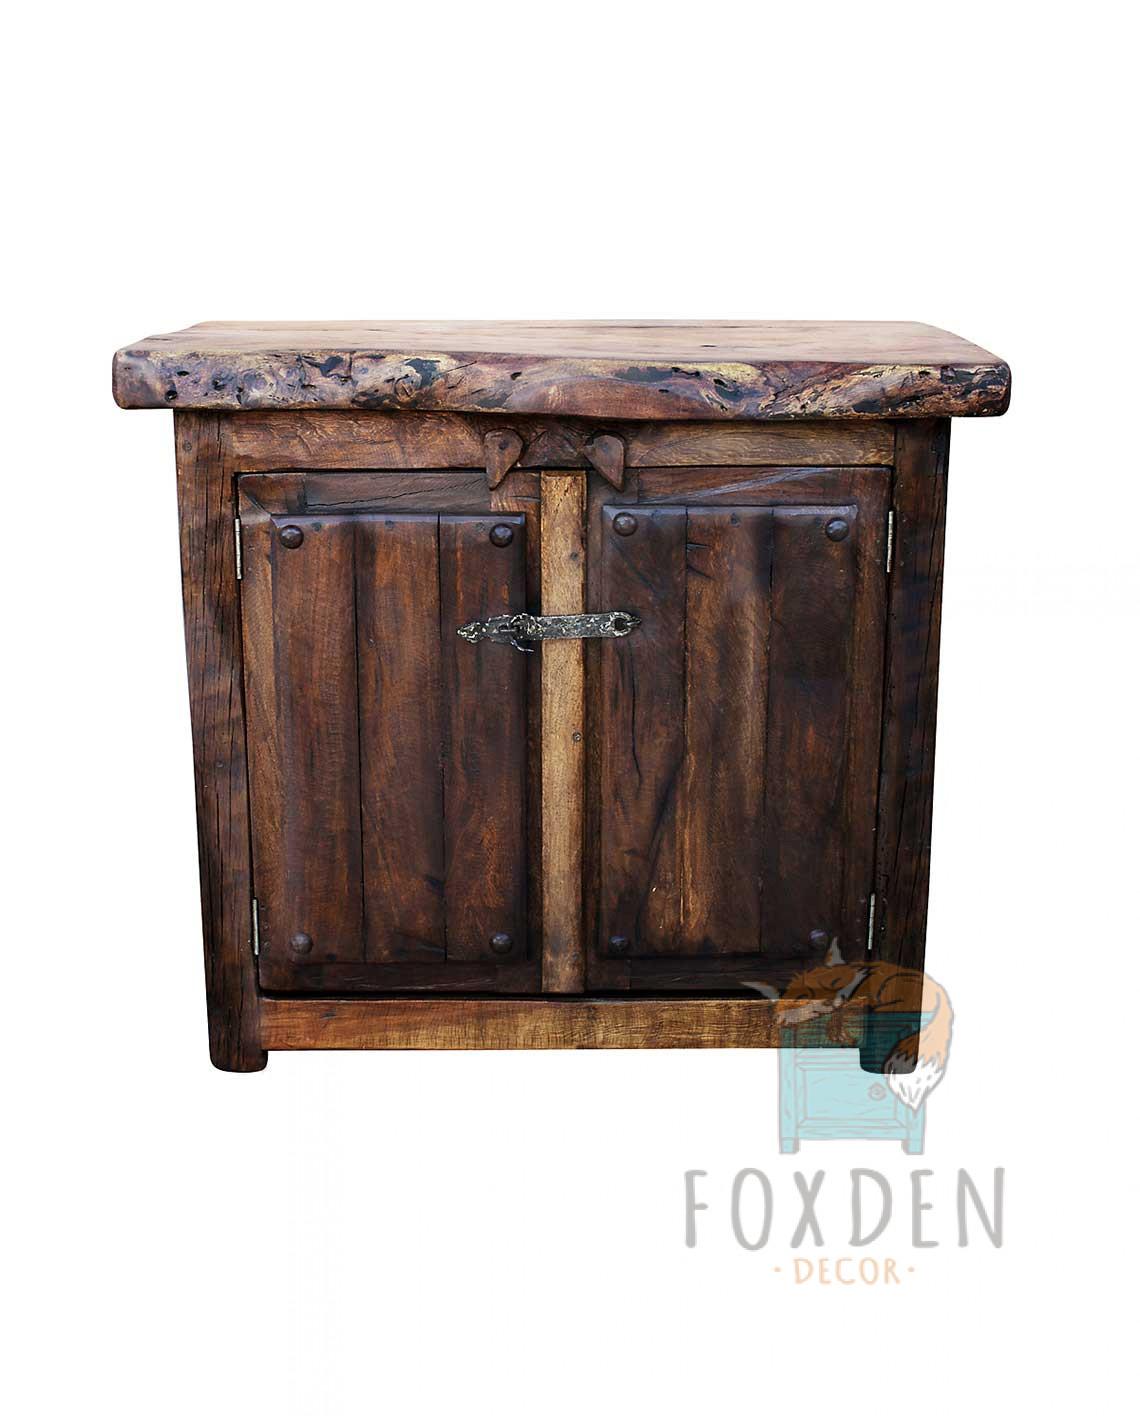 Buy Rustic Furniture Online Order Handcrafted Wood Furniture In